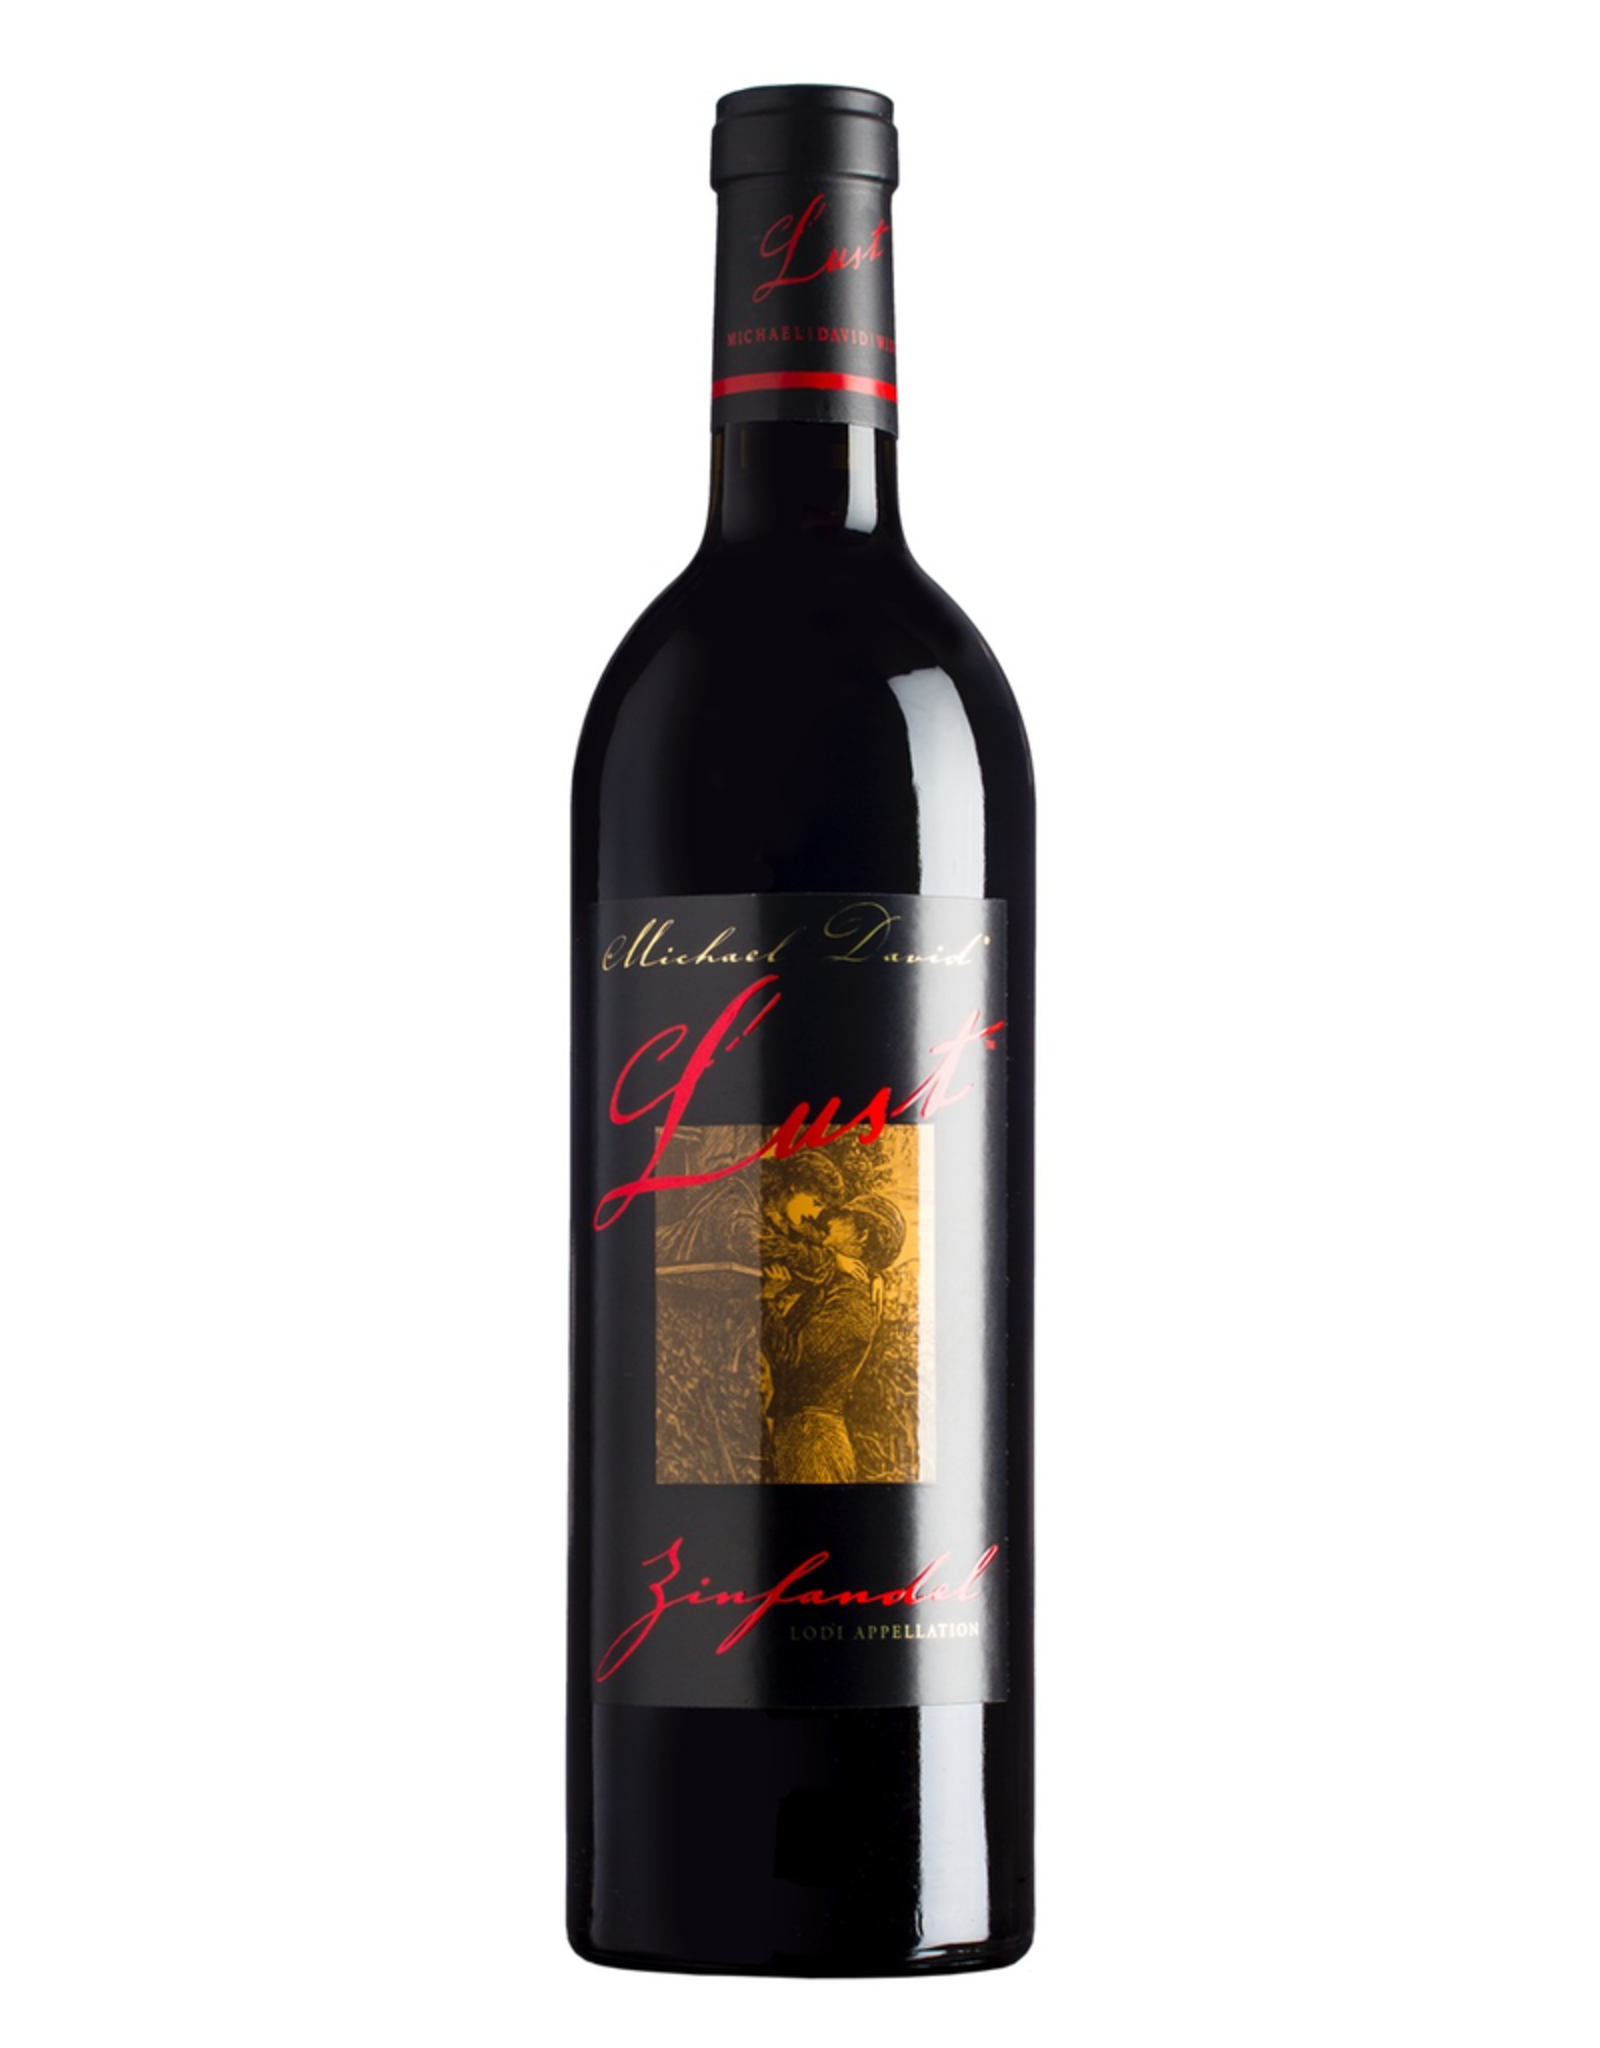 Red Wine 2016, Michael David Winery Lust, Zinfandel, Lodi, California, USA, 15.5% Alc, CTnr